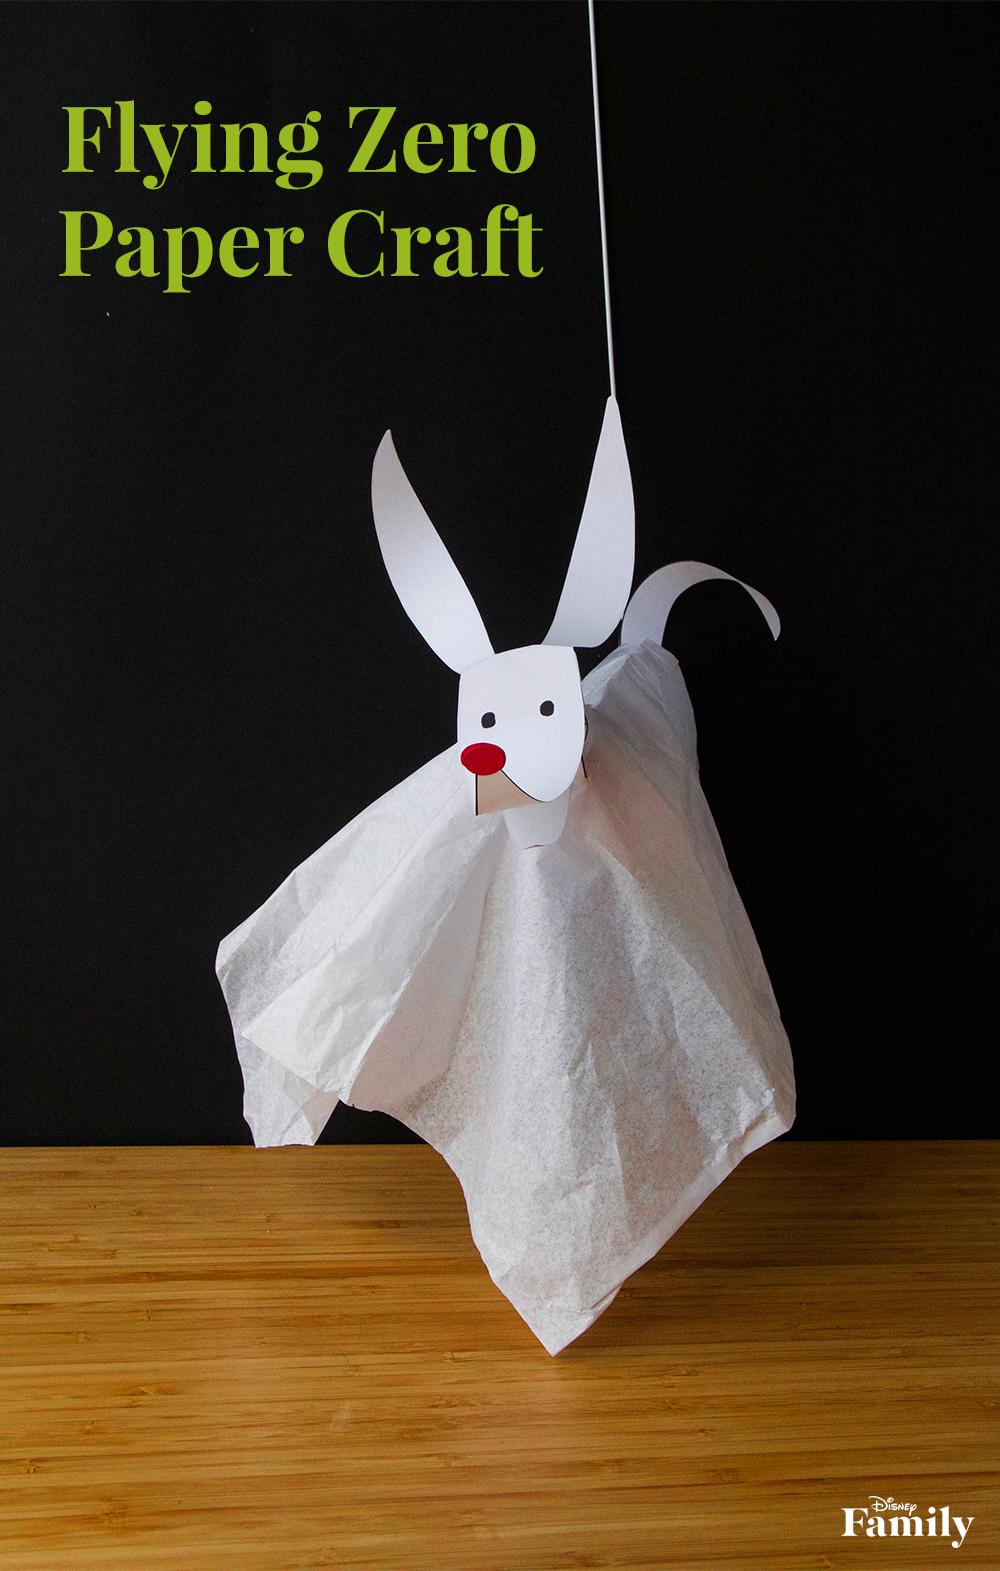 Crafts-The-Nightmare-Before-Christmas-Flying-Zero-Matthew-Reinhart-PIN.png